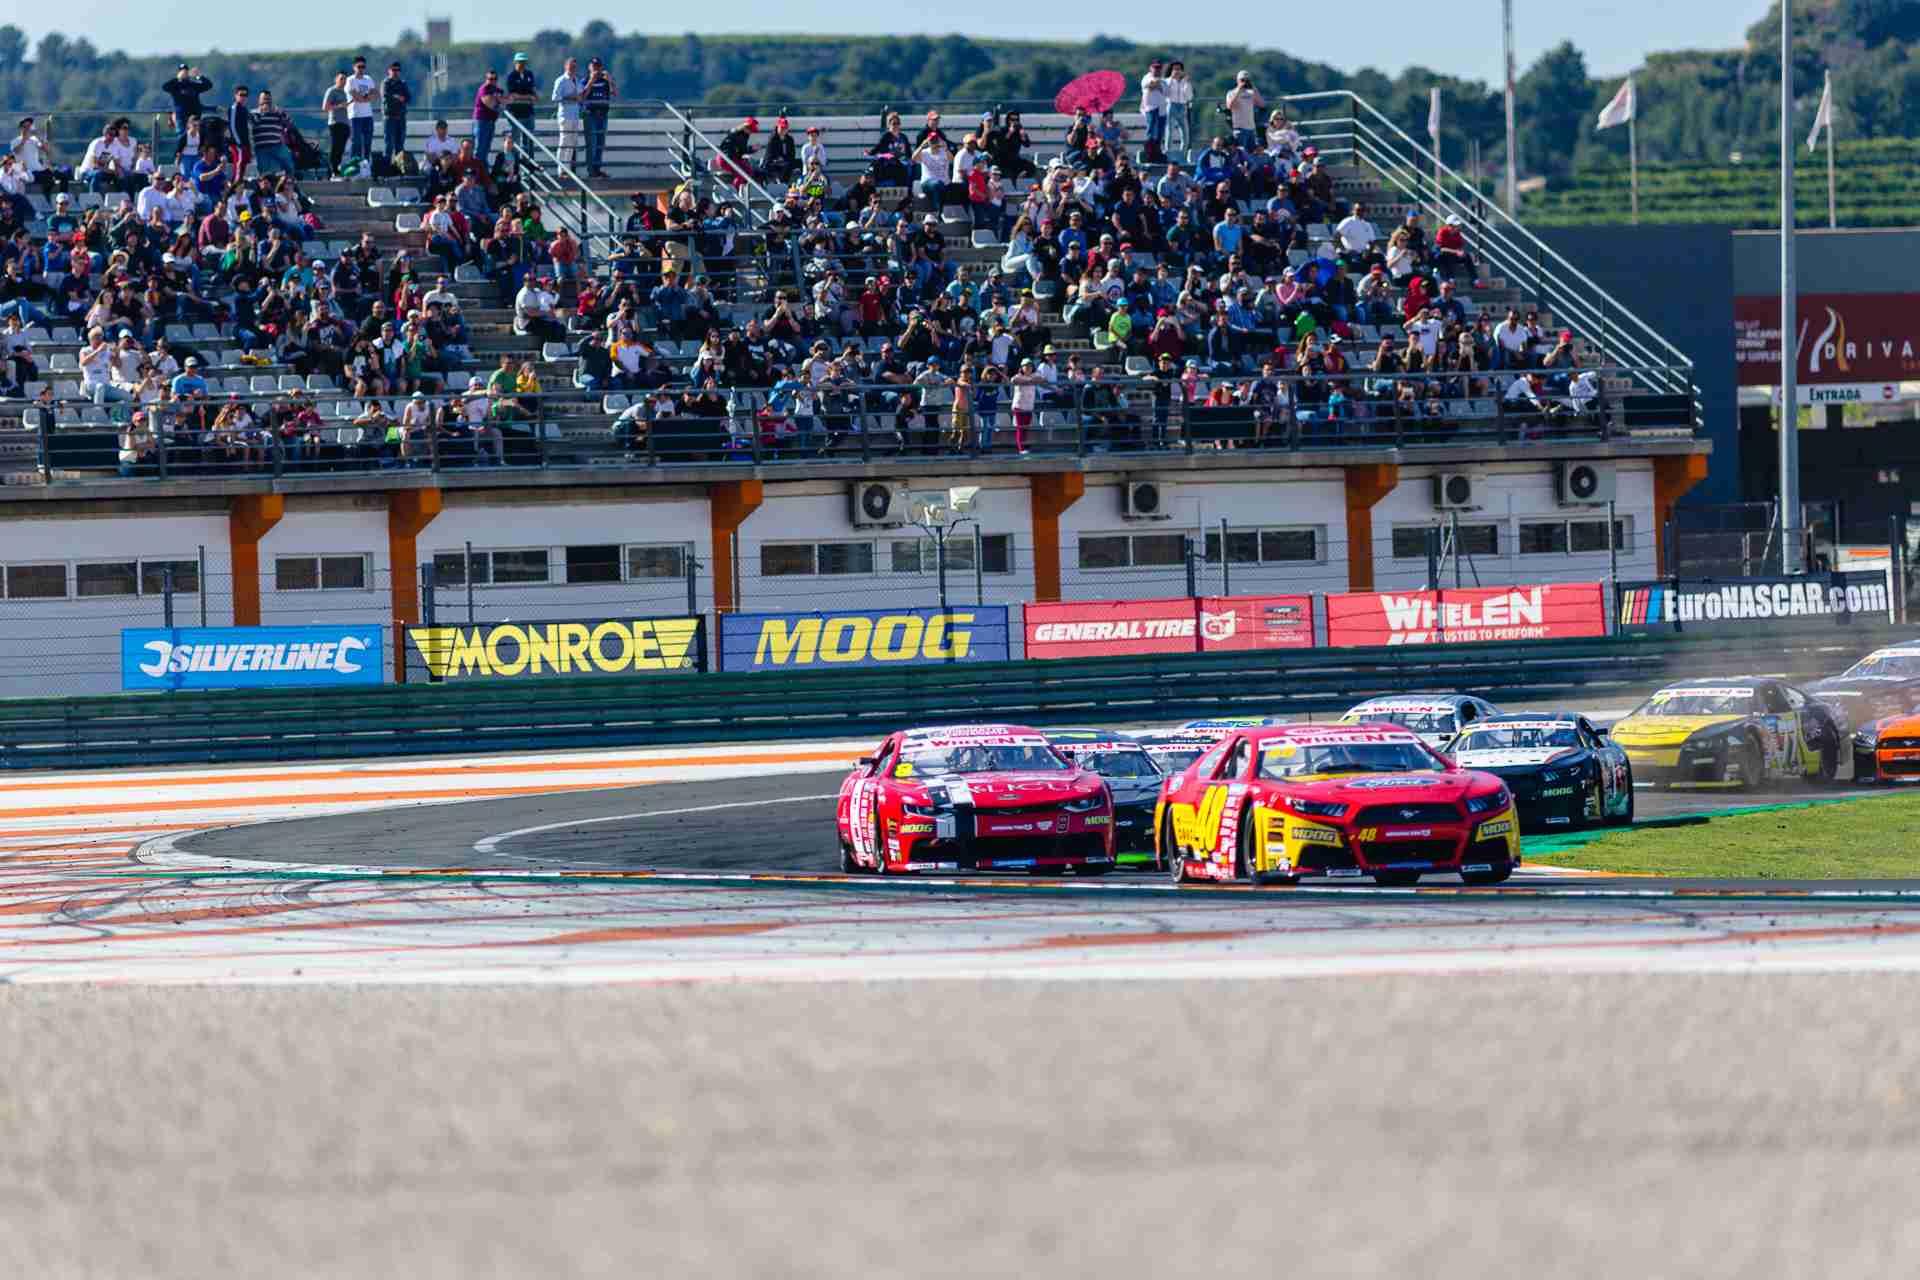 NASCAR WHELEN EURO SERIES 2019 ENTRA IN AZIONE A FRANCIACORTA QUESTO WEEKEND